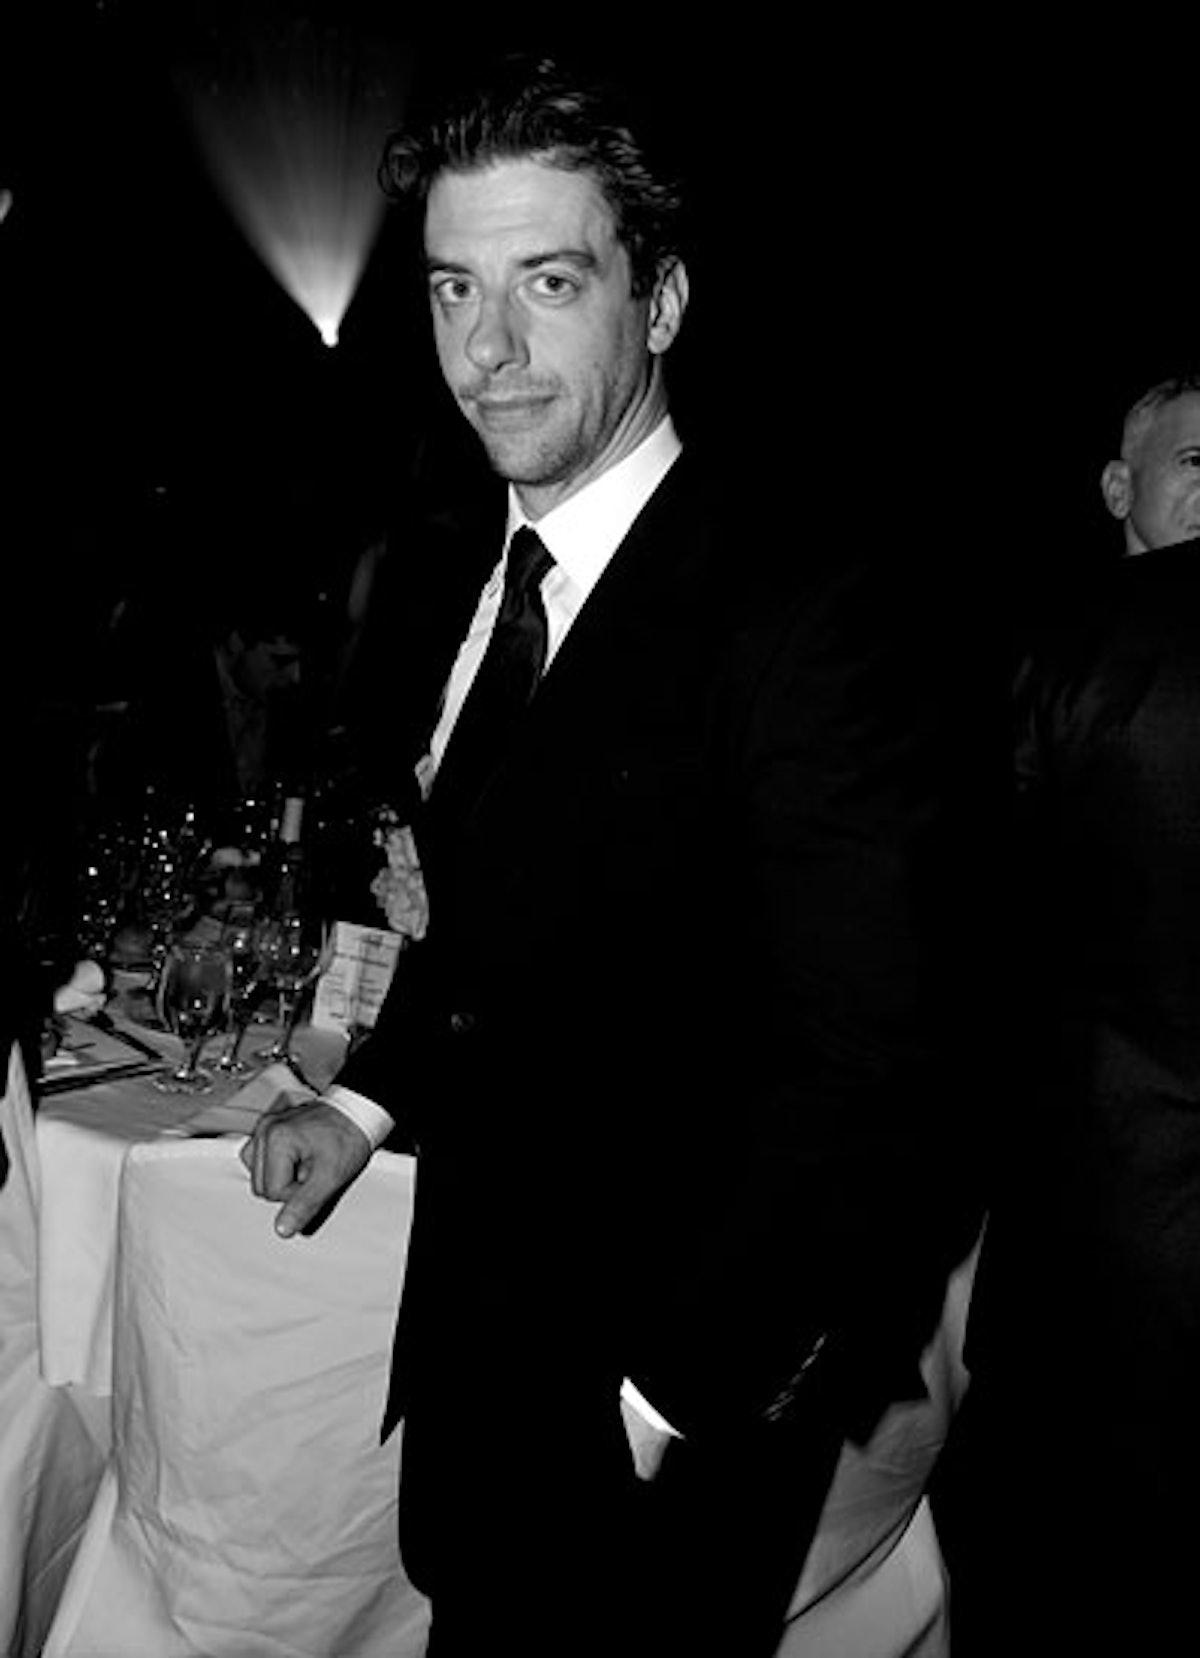 pass-glaad-awards-2013-11-v.jpg